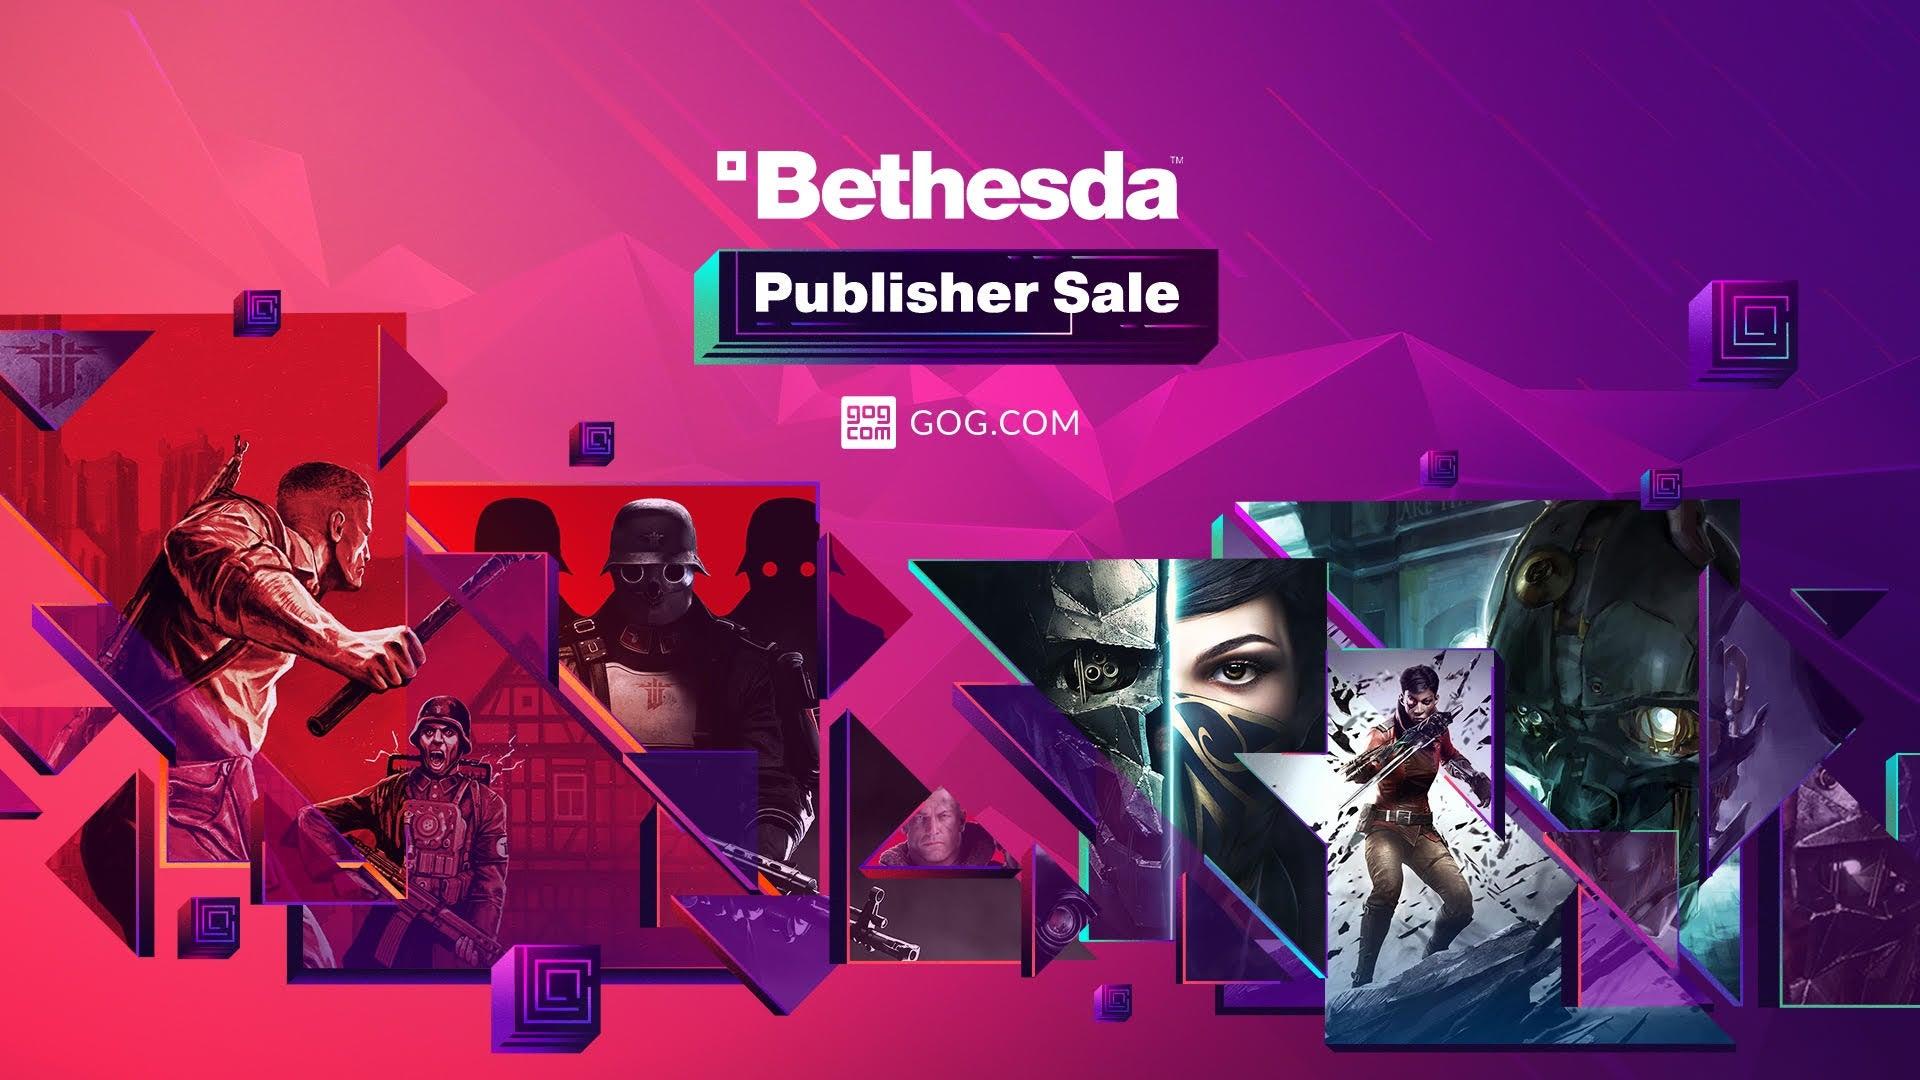 [gog] Bethesda Publisher Sale DRM - Free - RU & DE stores Prices. EX: Prey: Digital Deluxe Edition